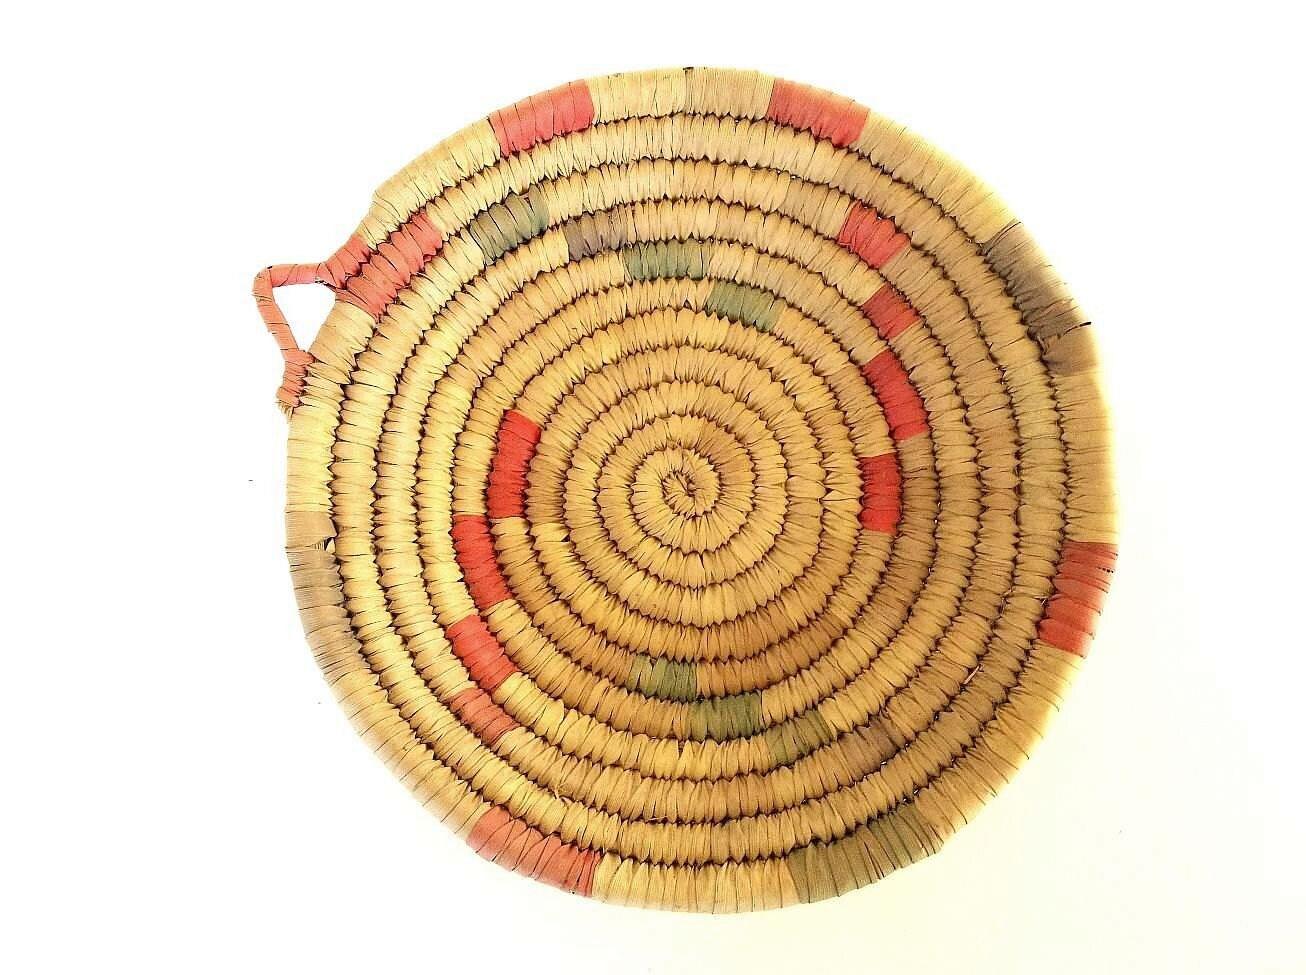 Handmade American Baskets : Vintage native american coiled basket handmade bowl